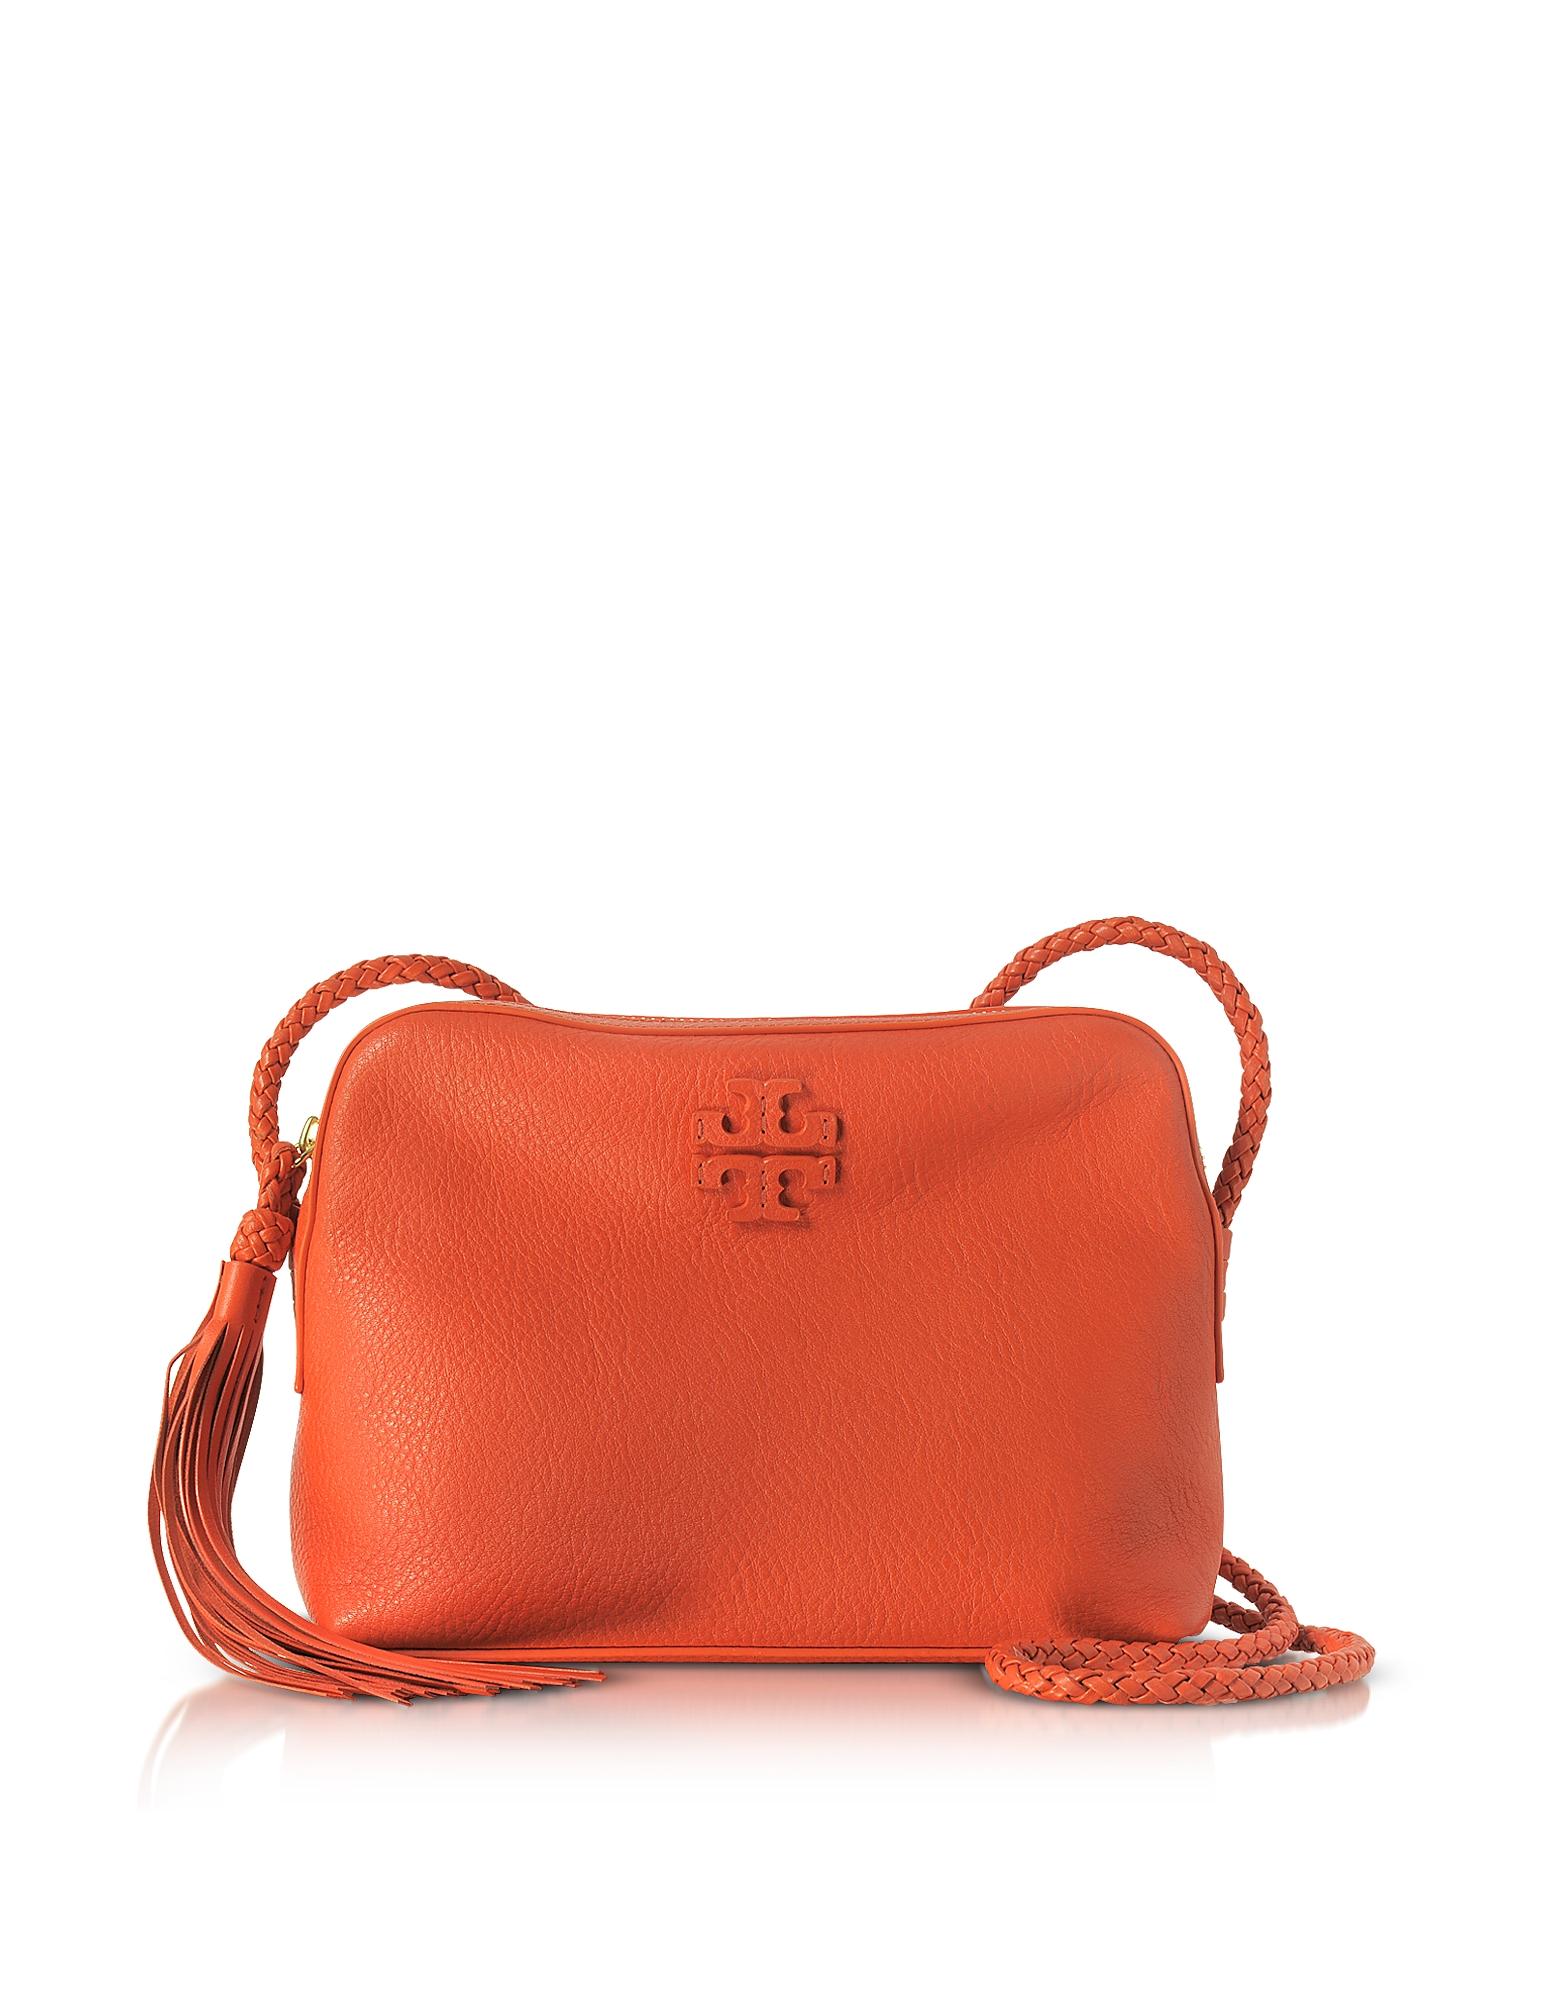 Tory Burch Handbags, Taylor Pebble Leather Camera Bag